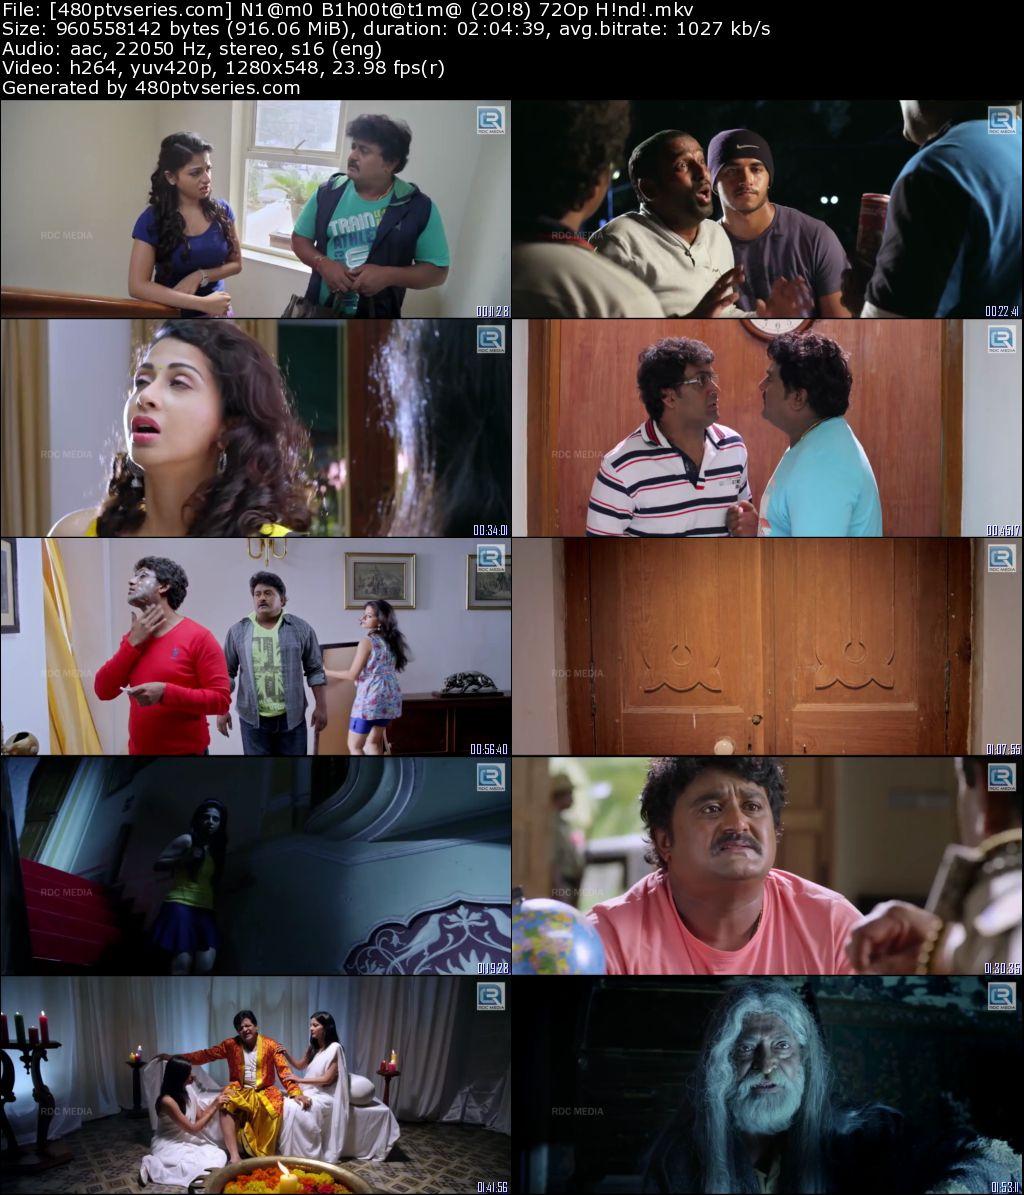 Download Namo Bhootatma (2018) 900MB Full Hindi Dubbed Movie Download 720p HDRip Free Watch Online Full Movie Download Worldfree4u 9xmovies